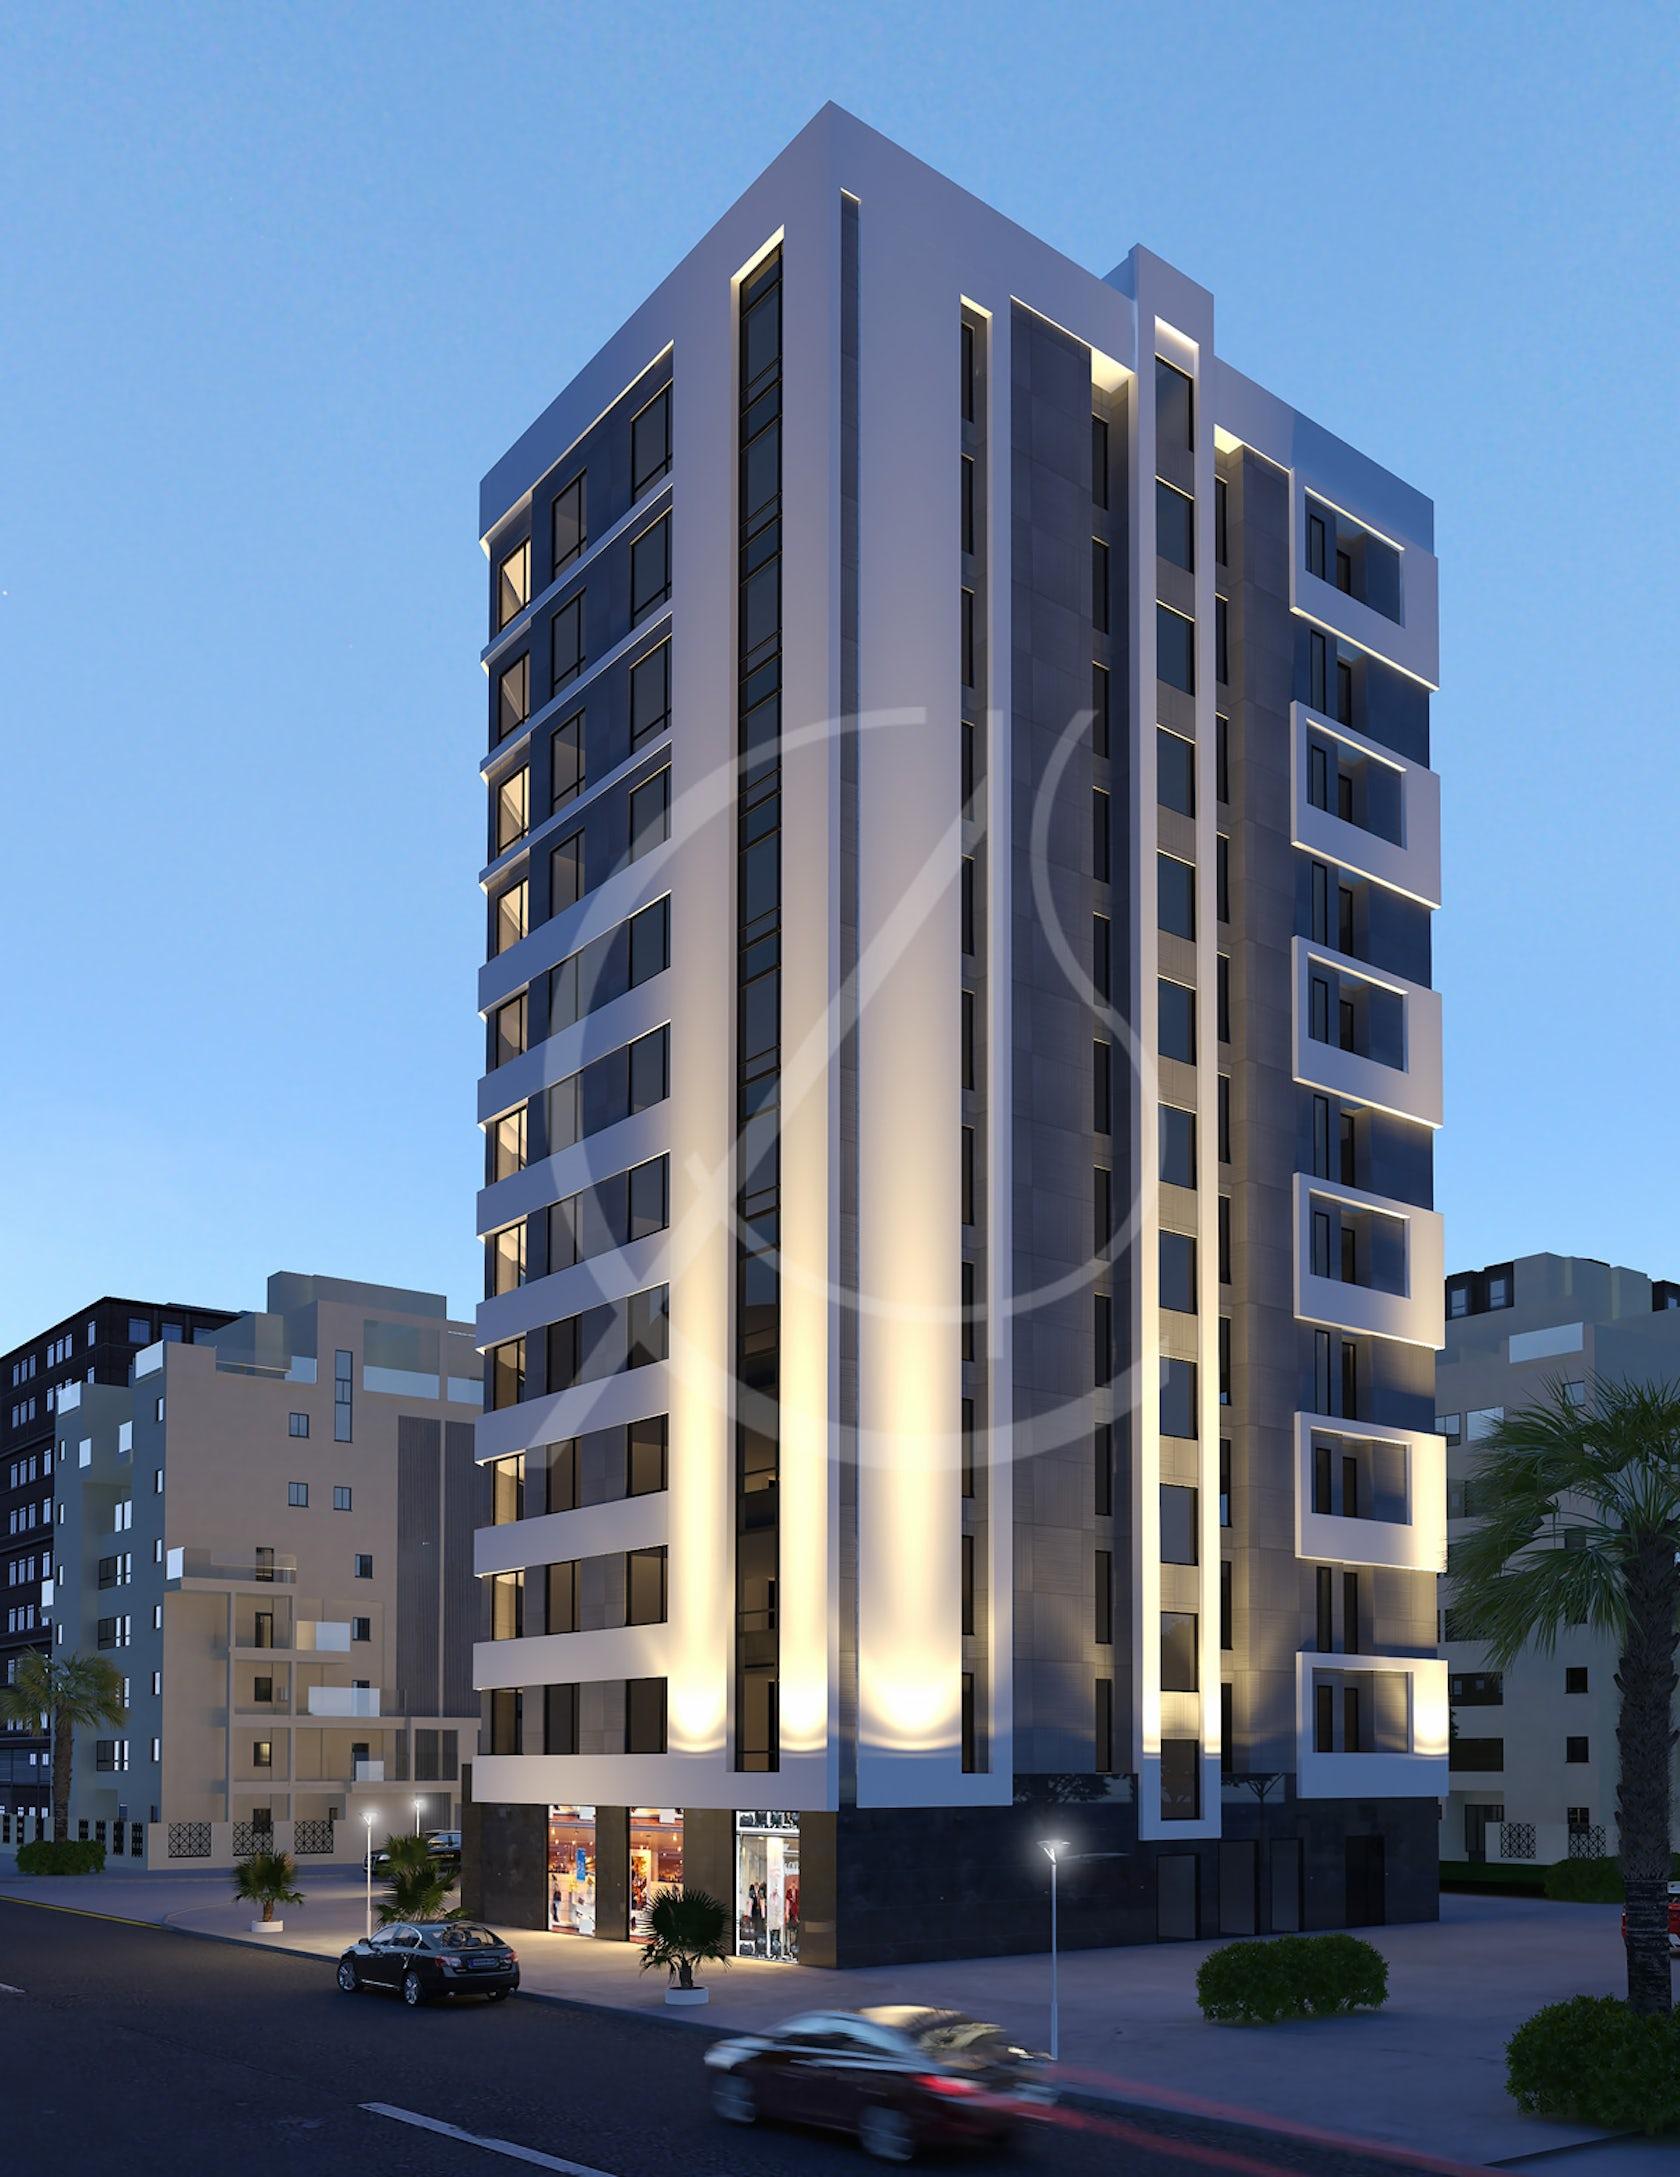 12 Story Modern Apartment Exterior Design